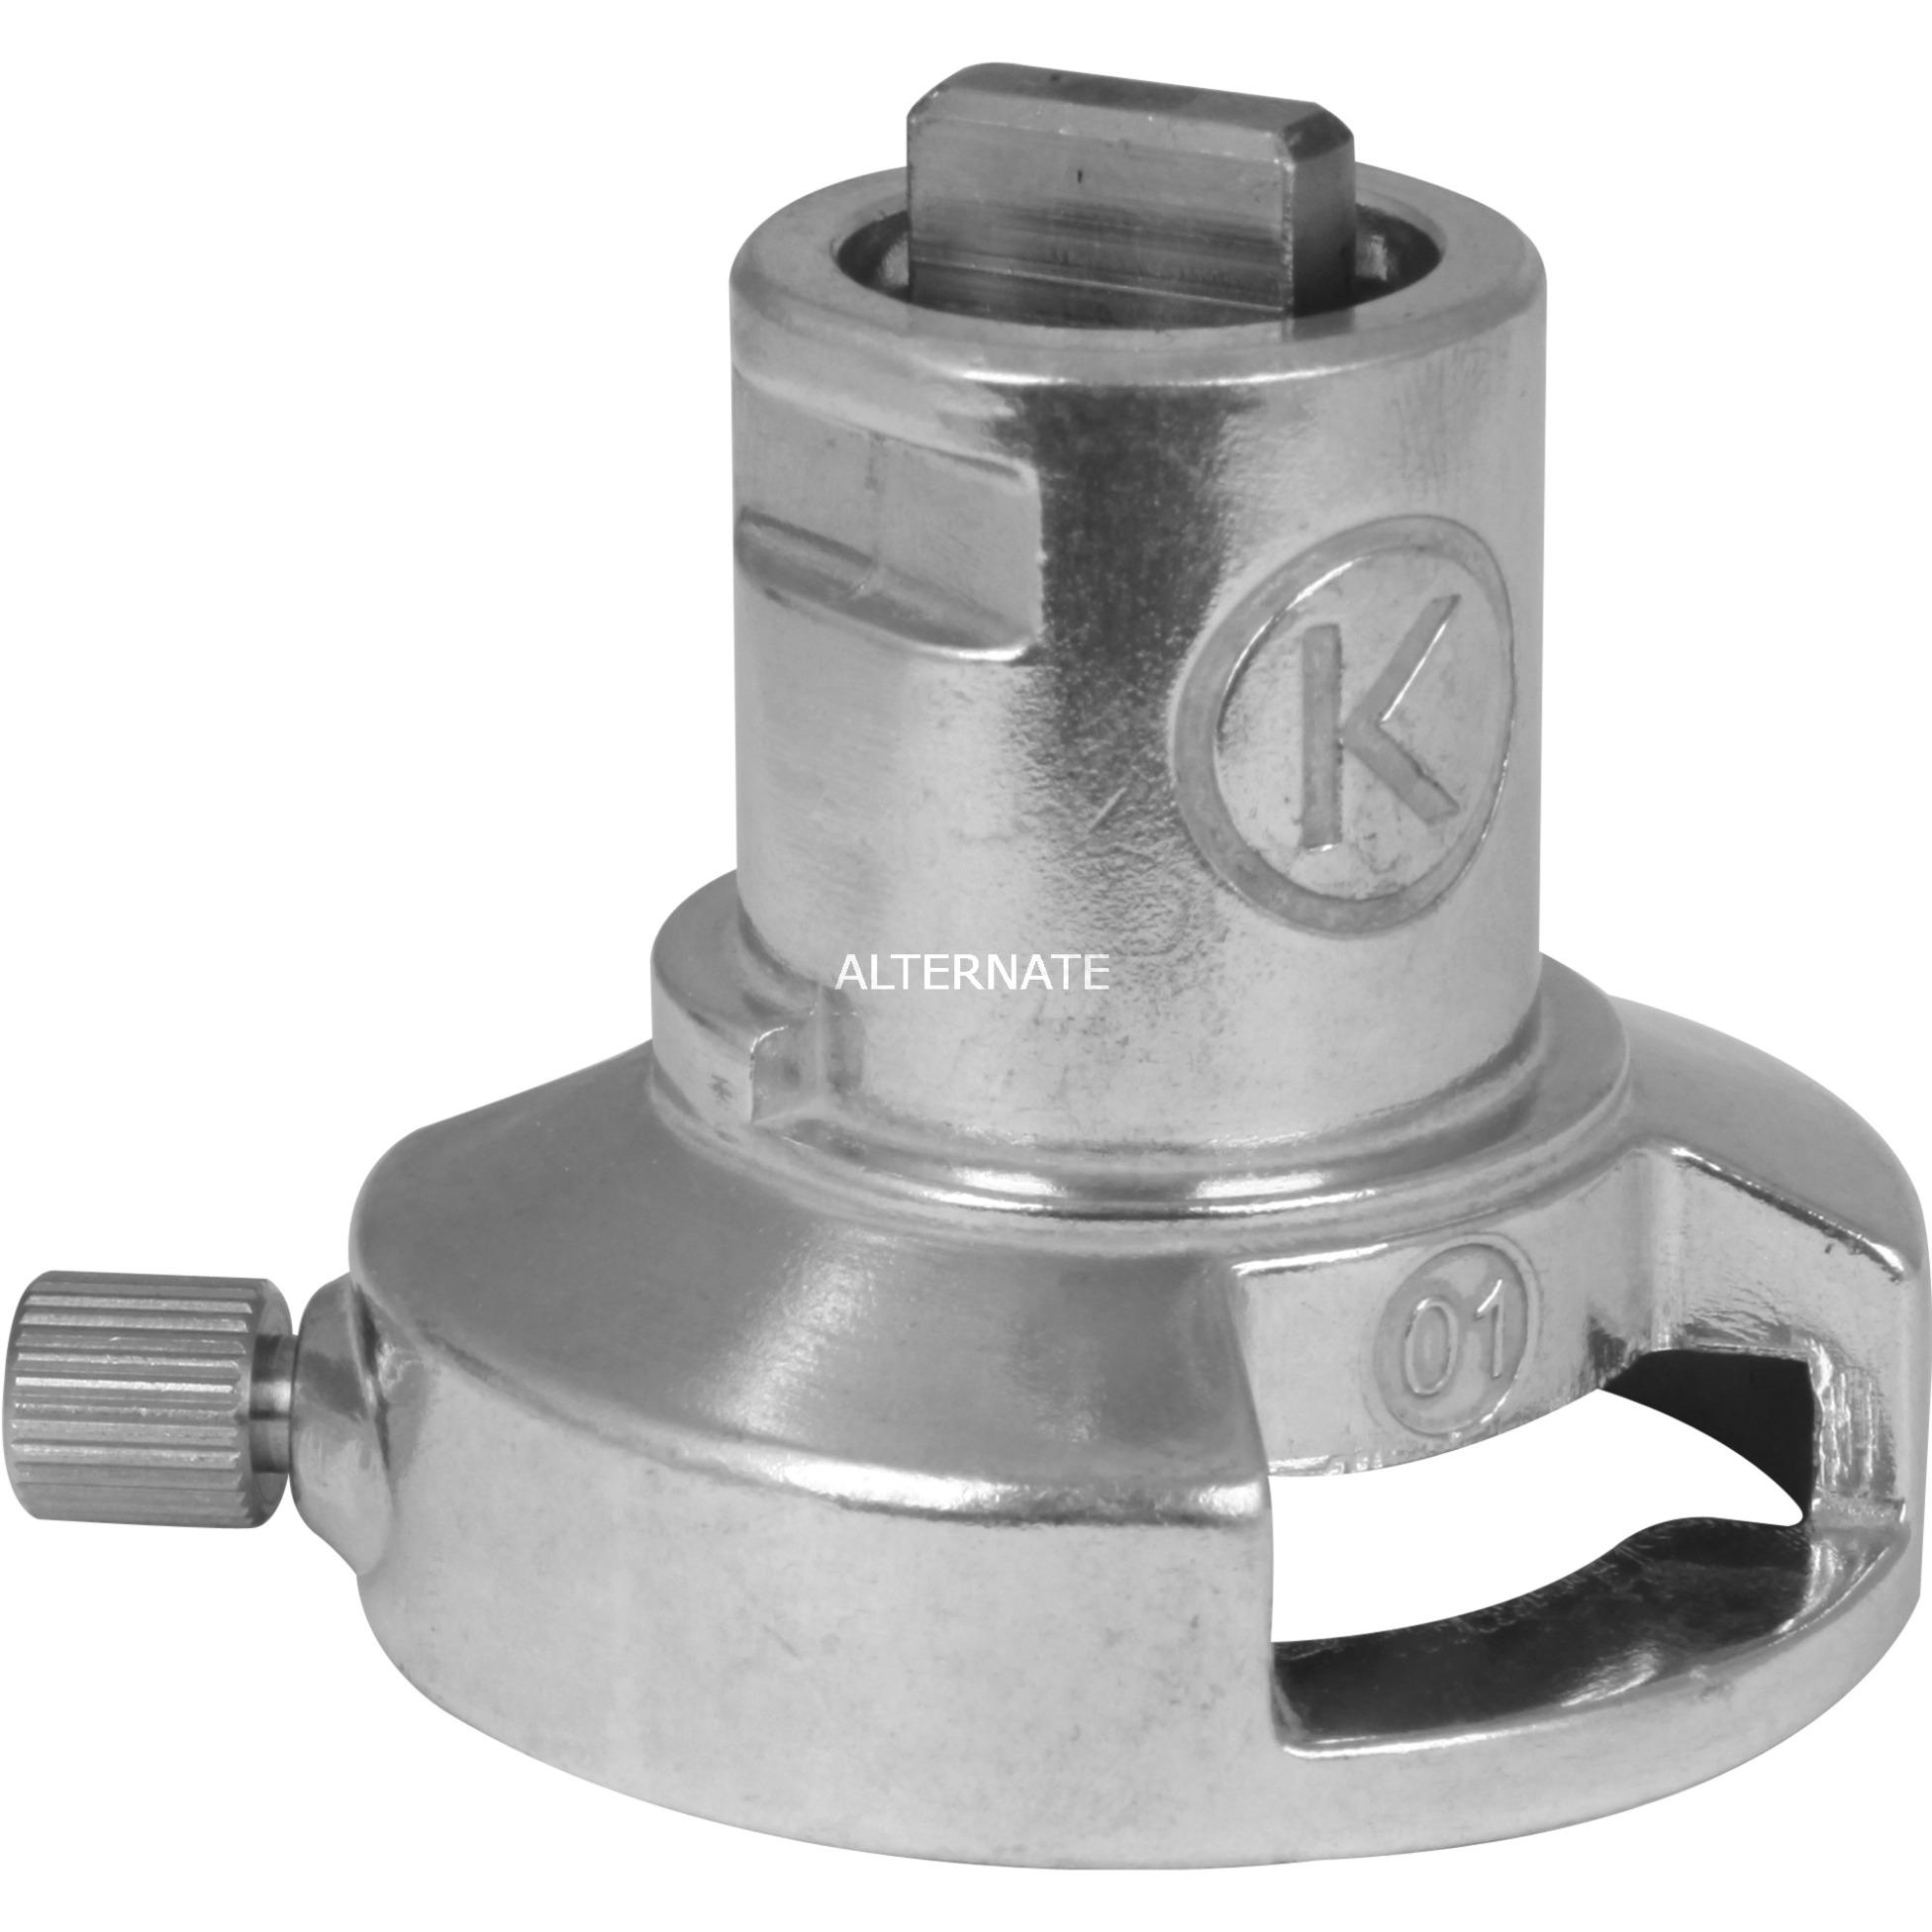 Image of Adapter KAT001ME